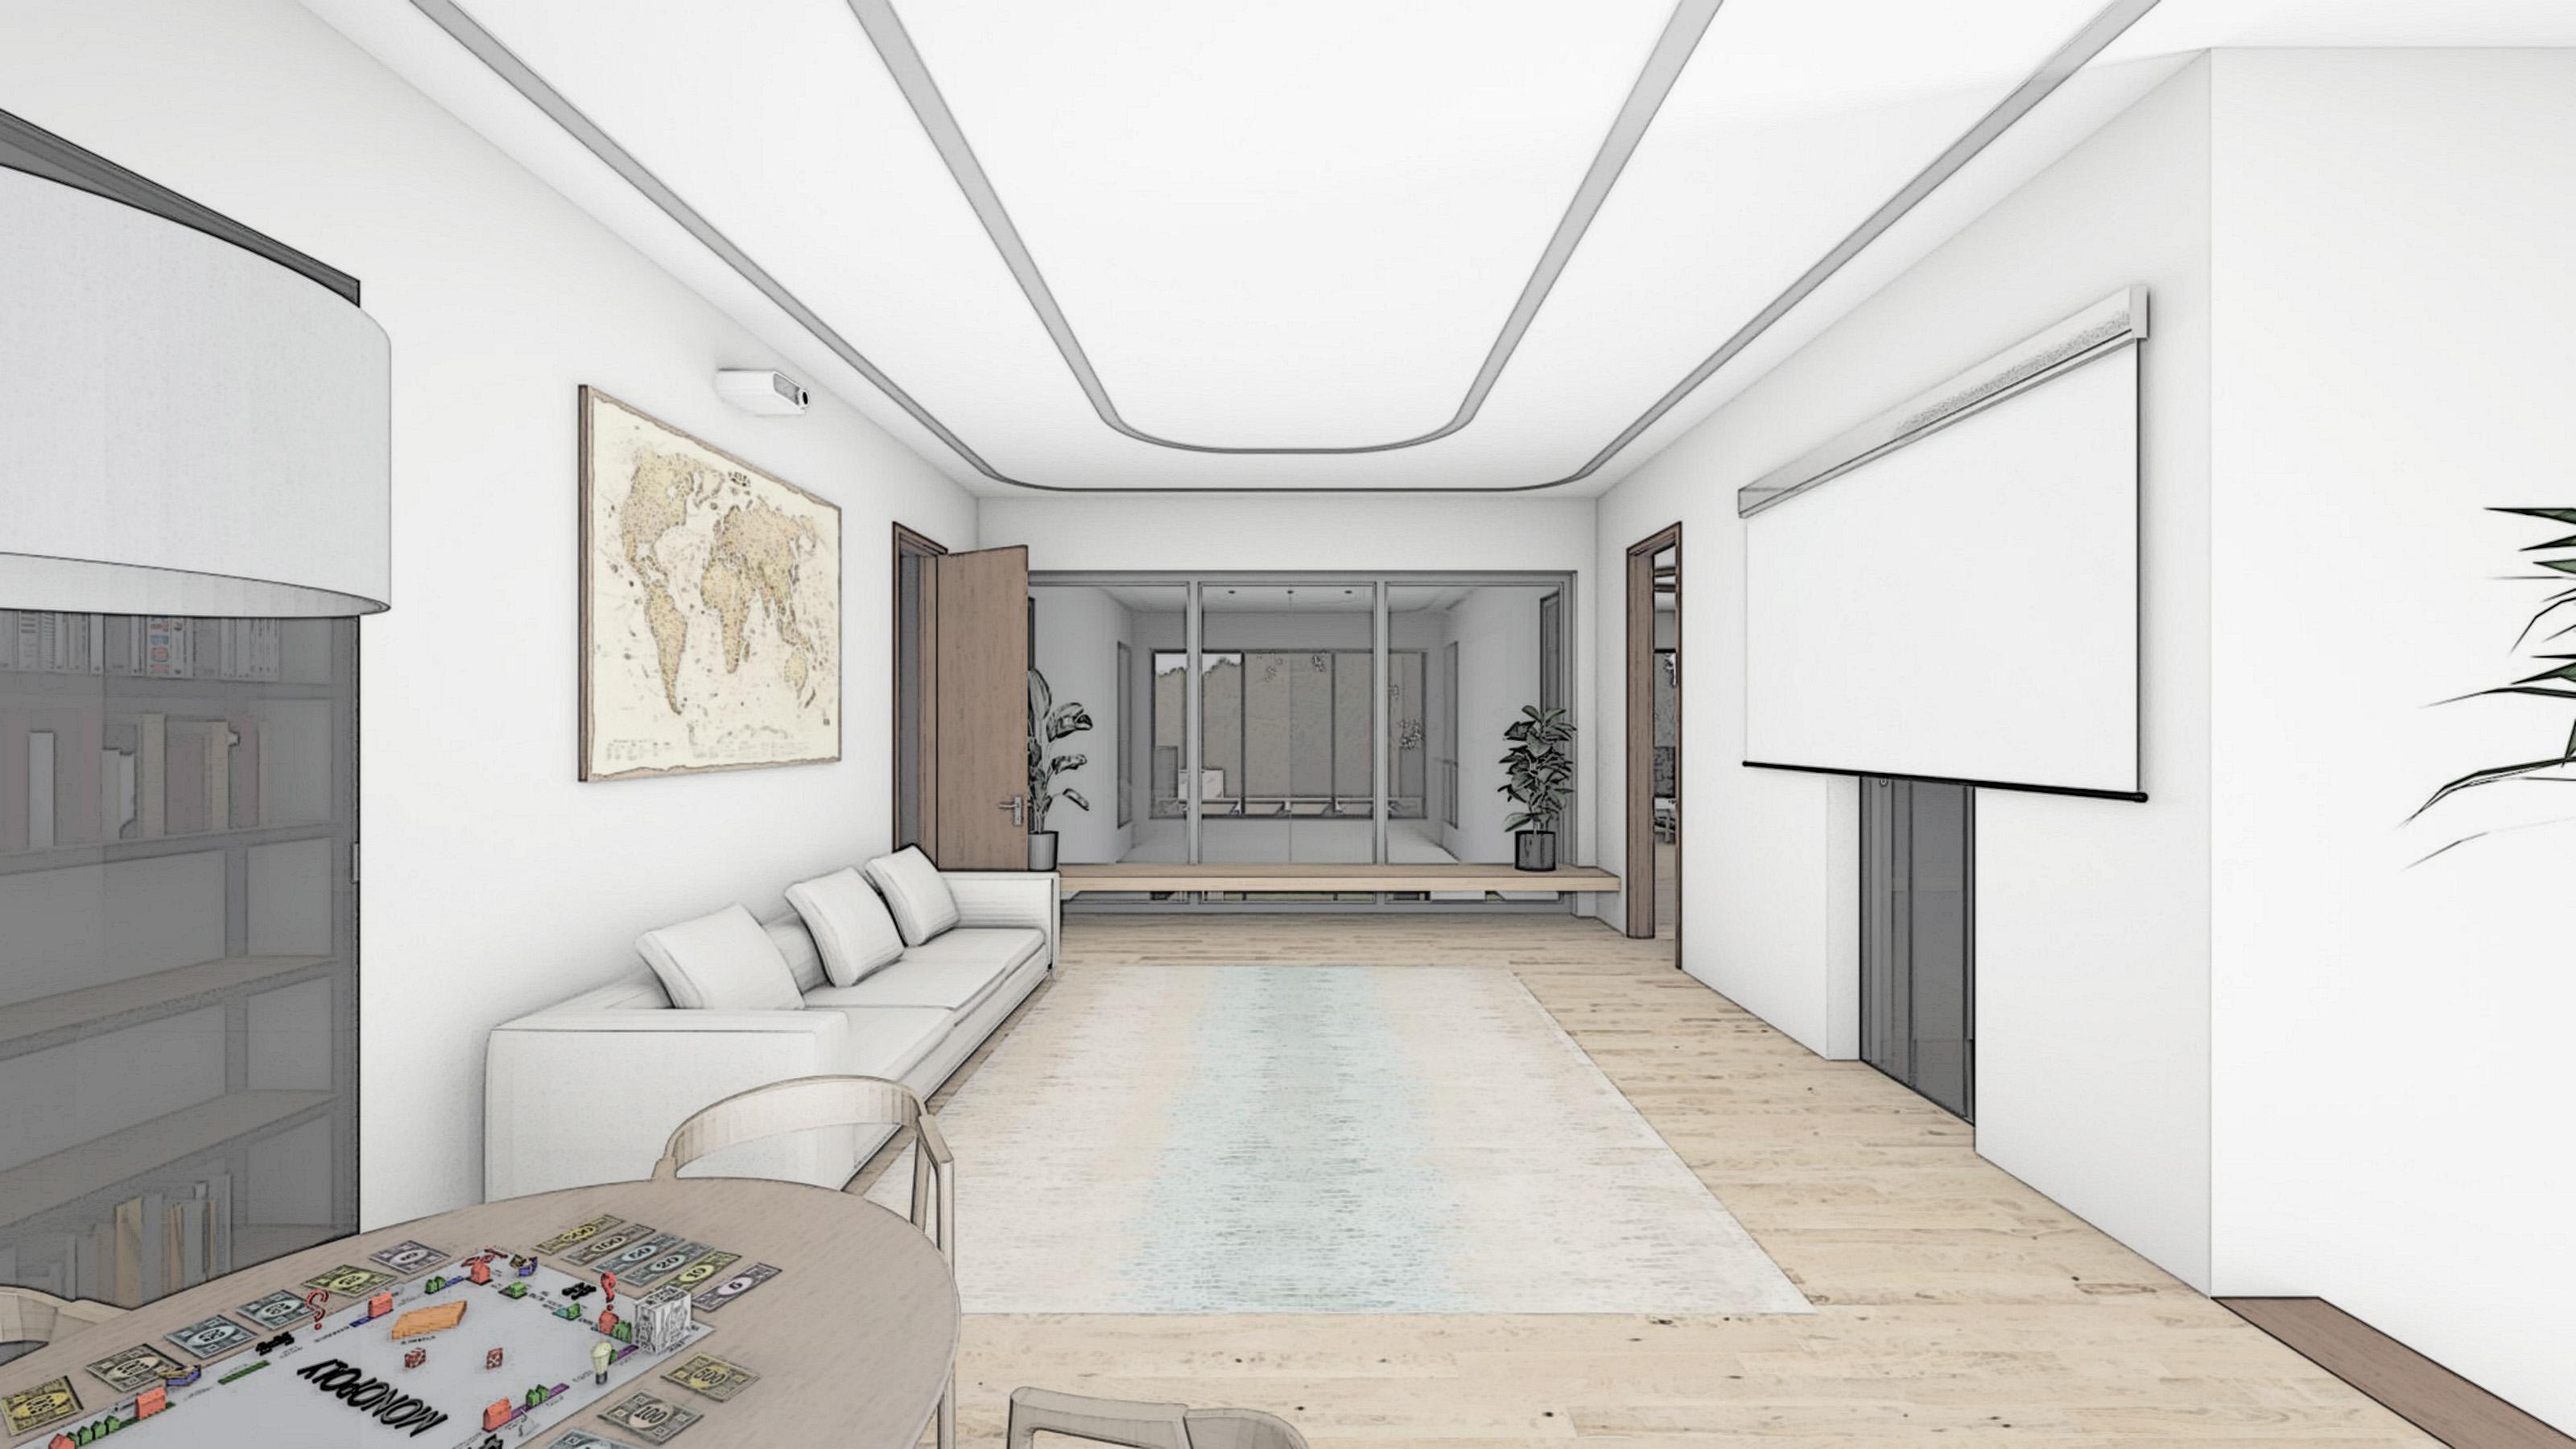 Изображение для проекта Проект особняка в Латвии в стиле модерн 2902